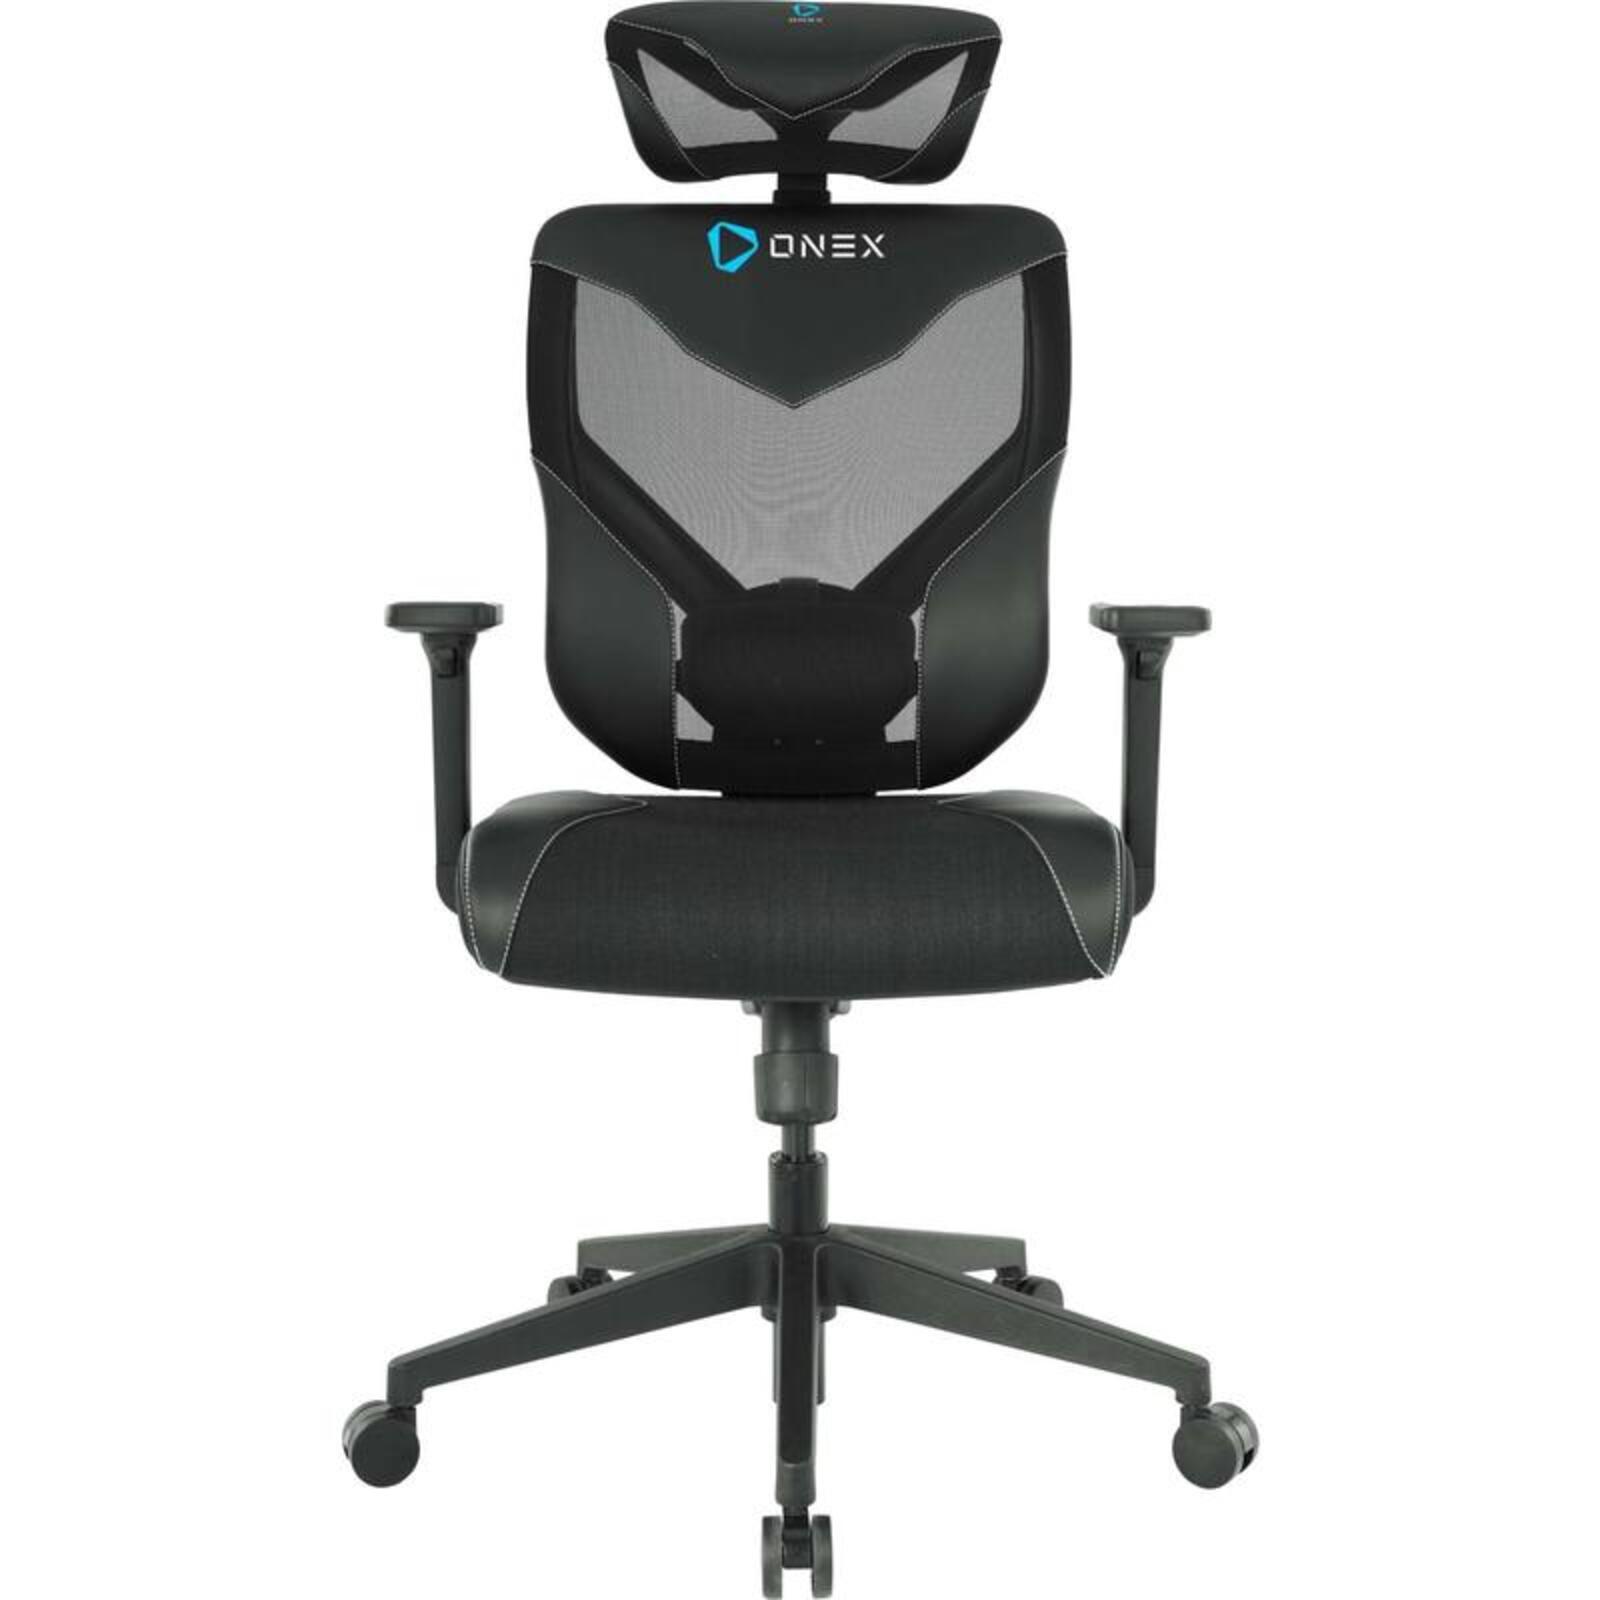 ONEX GT-V7-X Black Vida Ergonomic Office Chair, w/55mm PA Caster